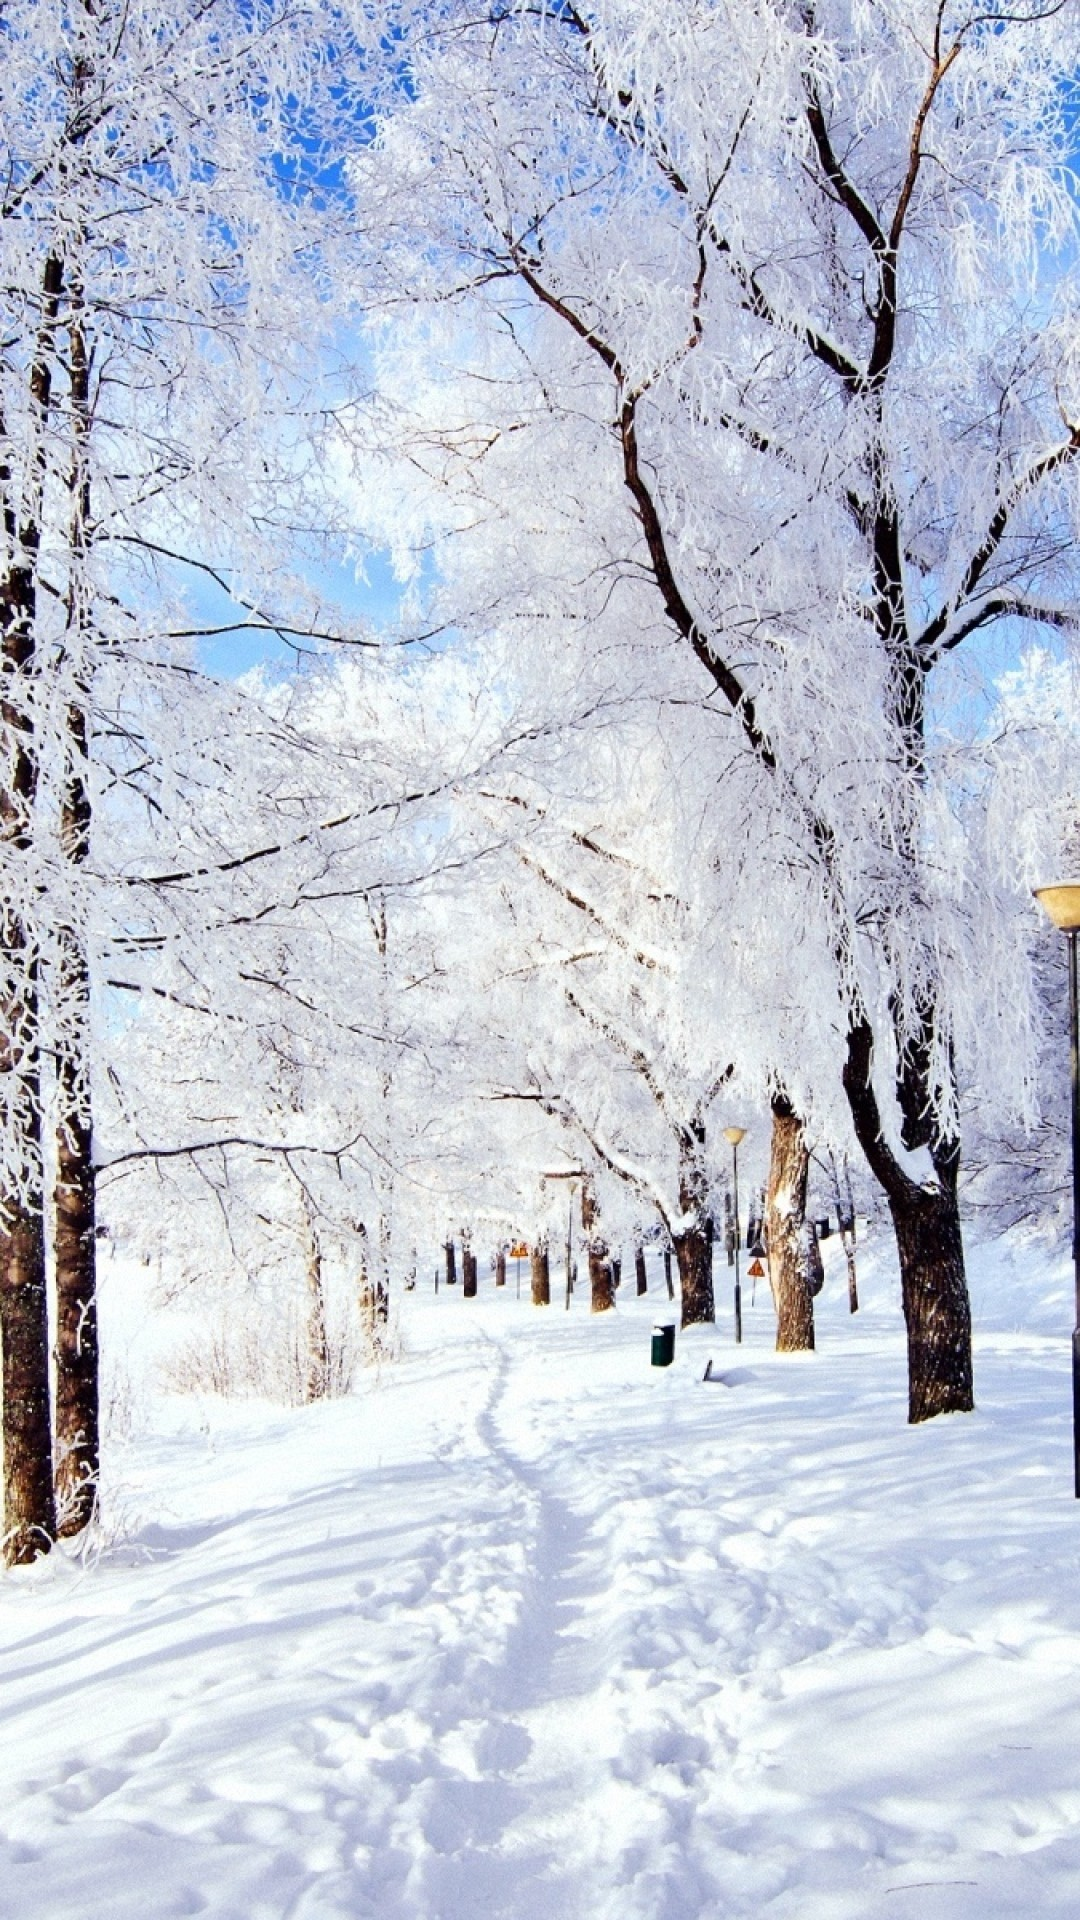 Snow Trail in winter